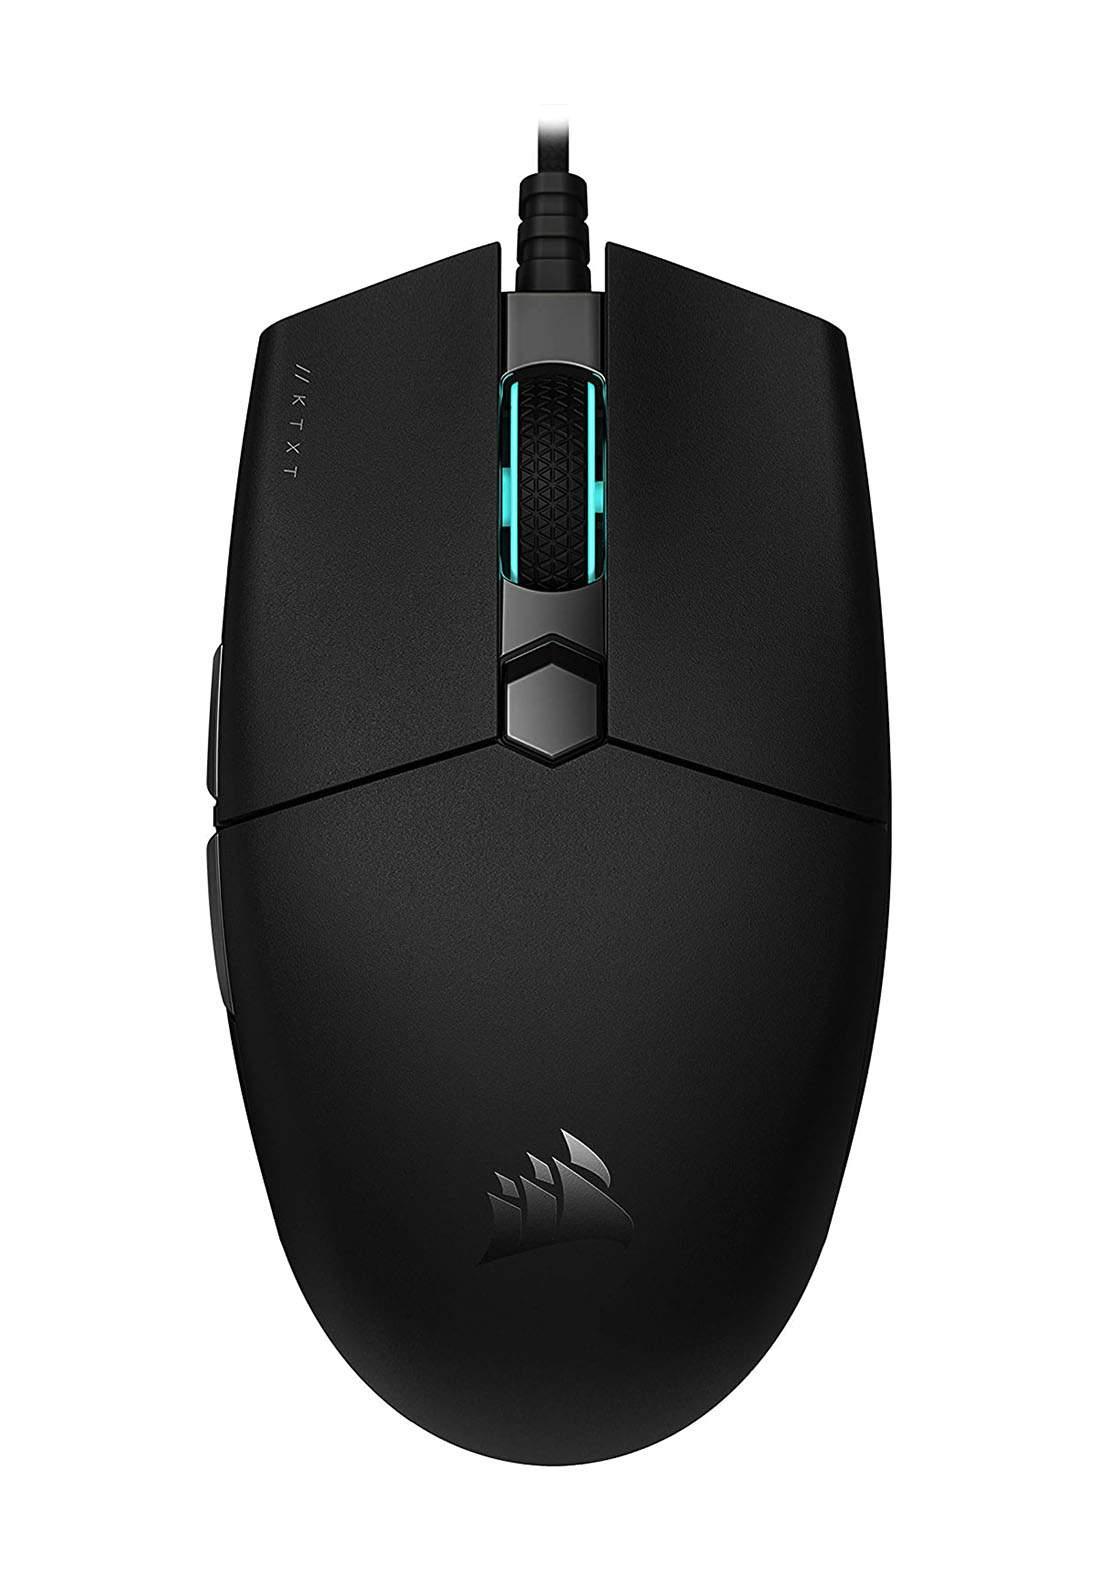 Corsair Katar Pro Wireless Lightweight Fps-Moba Gaming Mouse ماوس